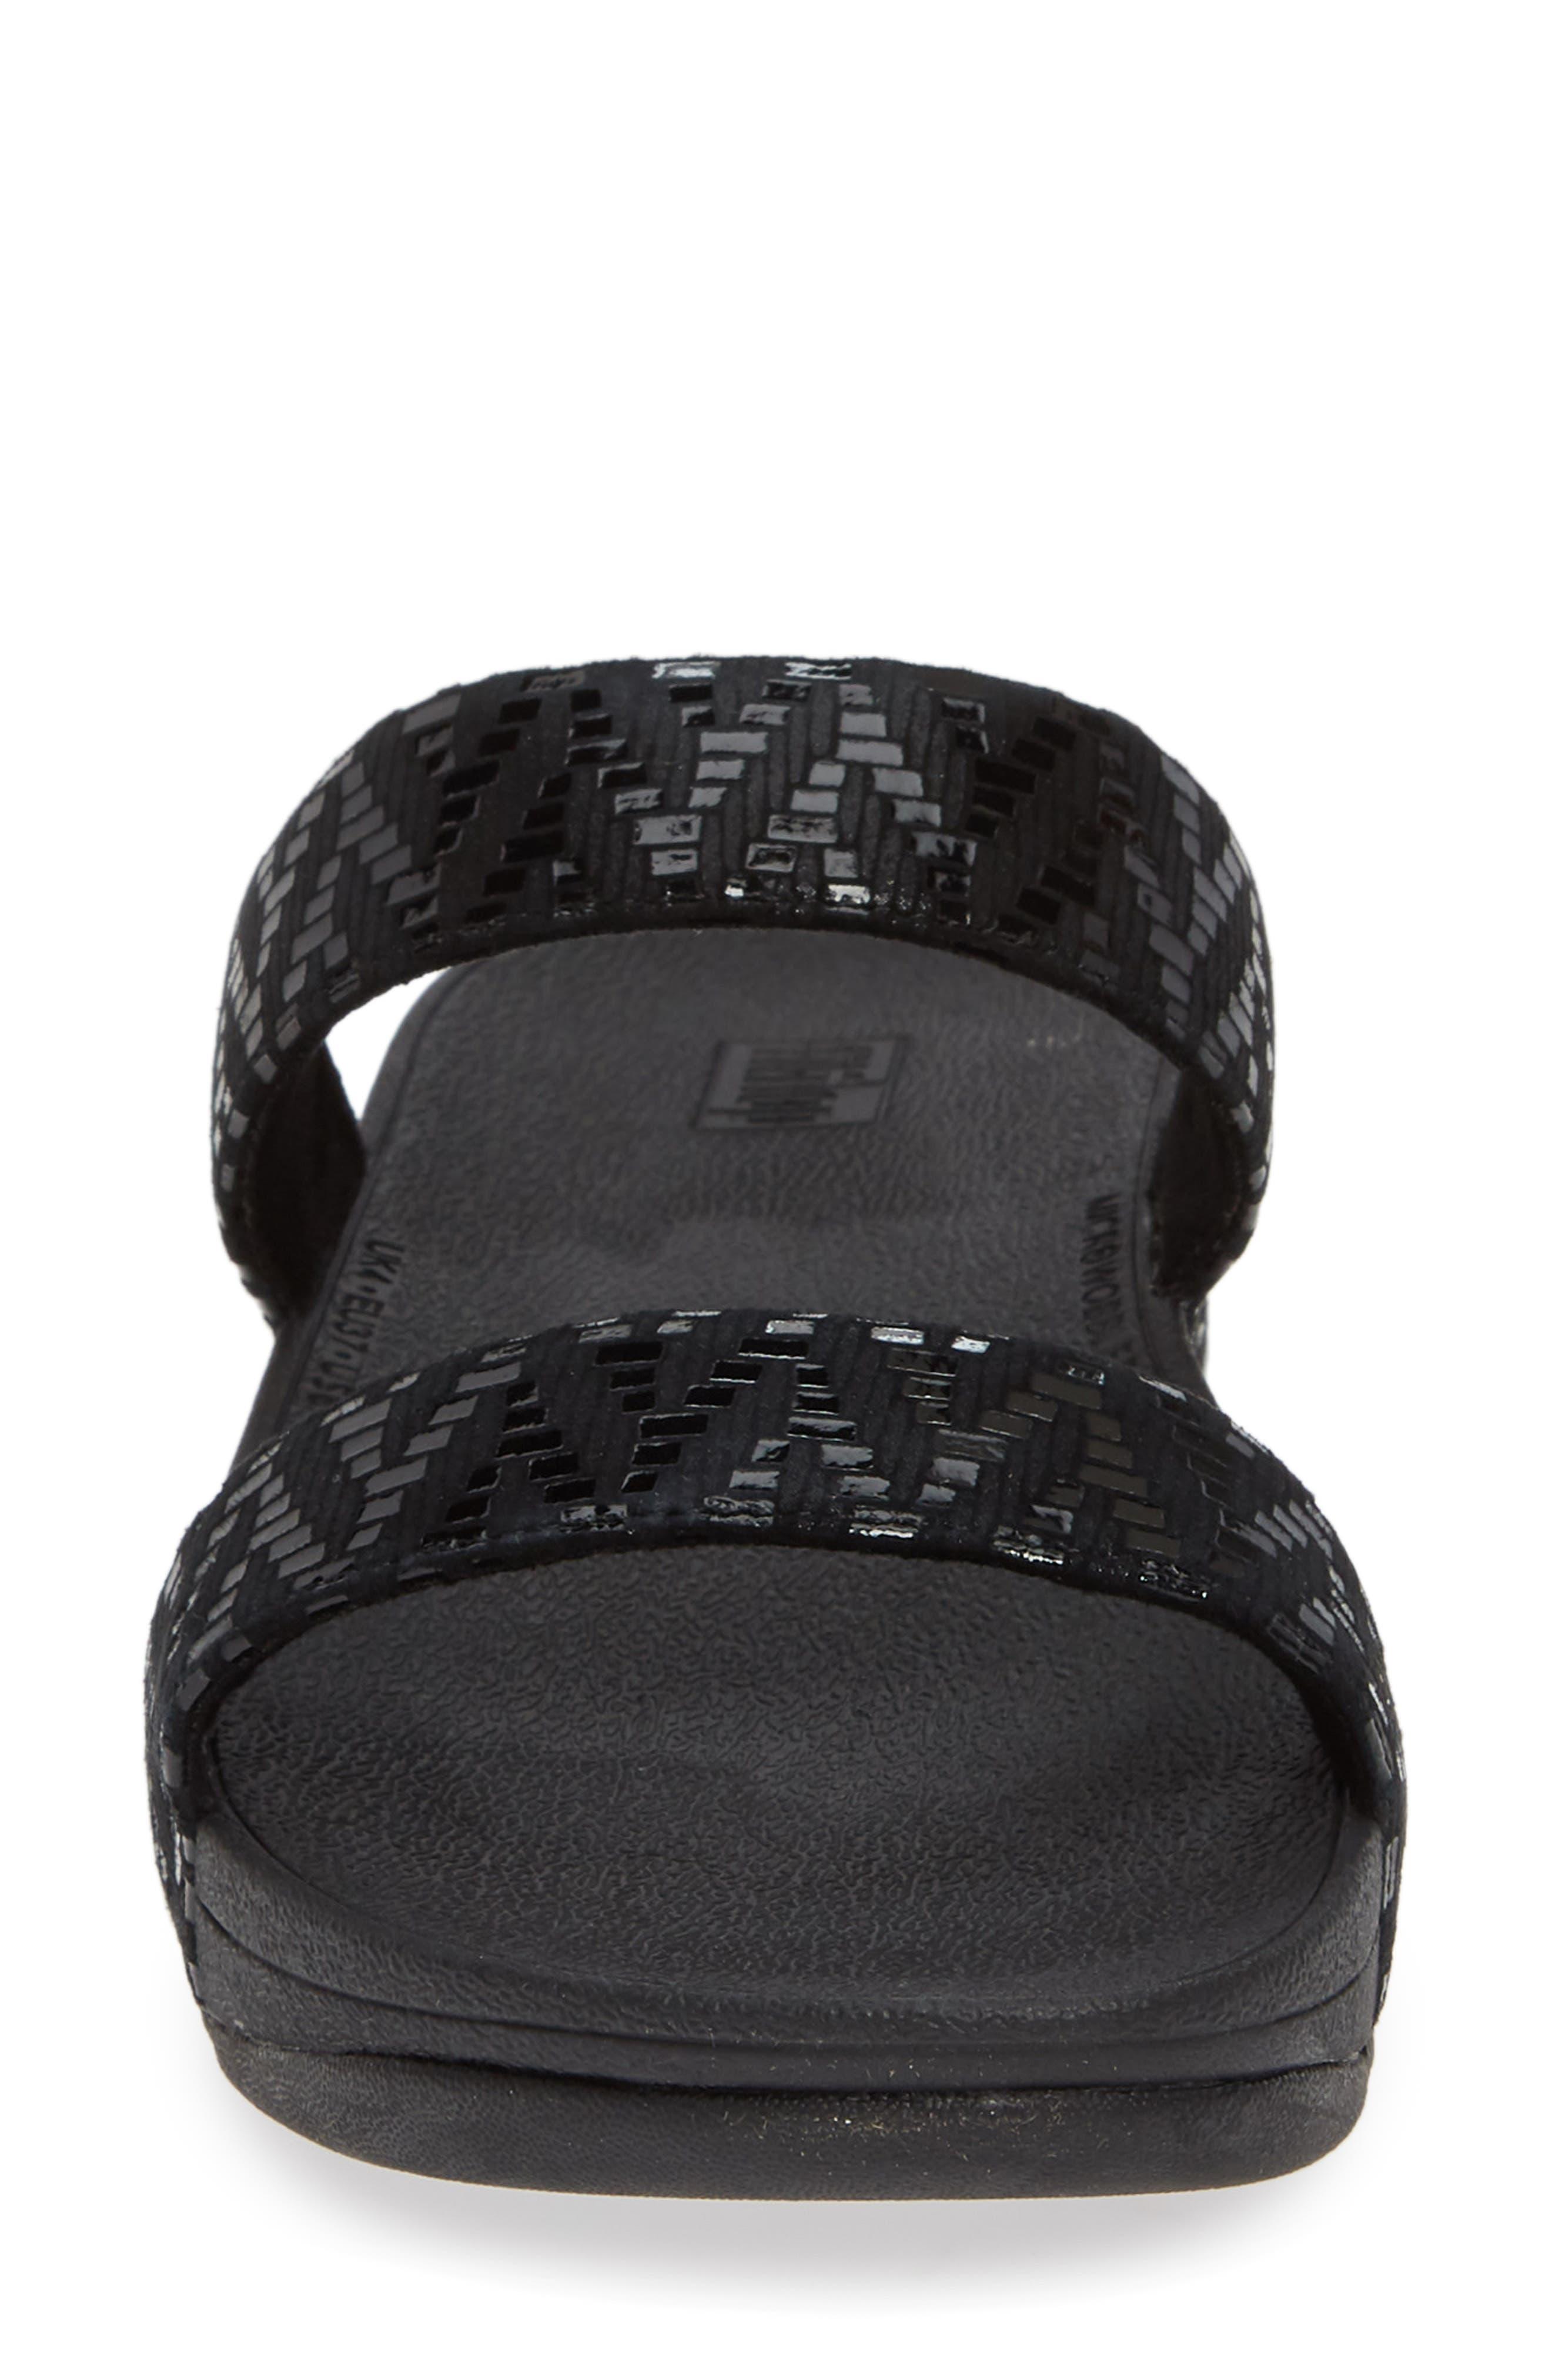 FITFLOP, Lottie Chevron Wedge Slide Sandal, Alternate thumbnail 4, color, BLACK FABRIC